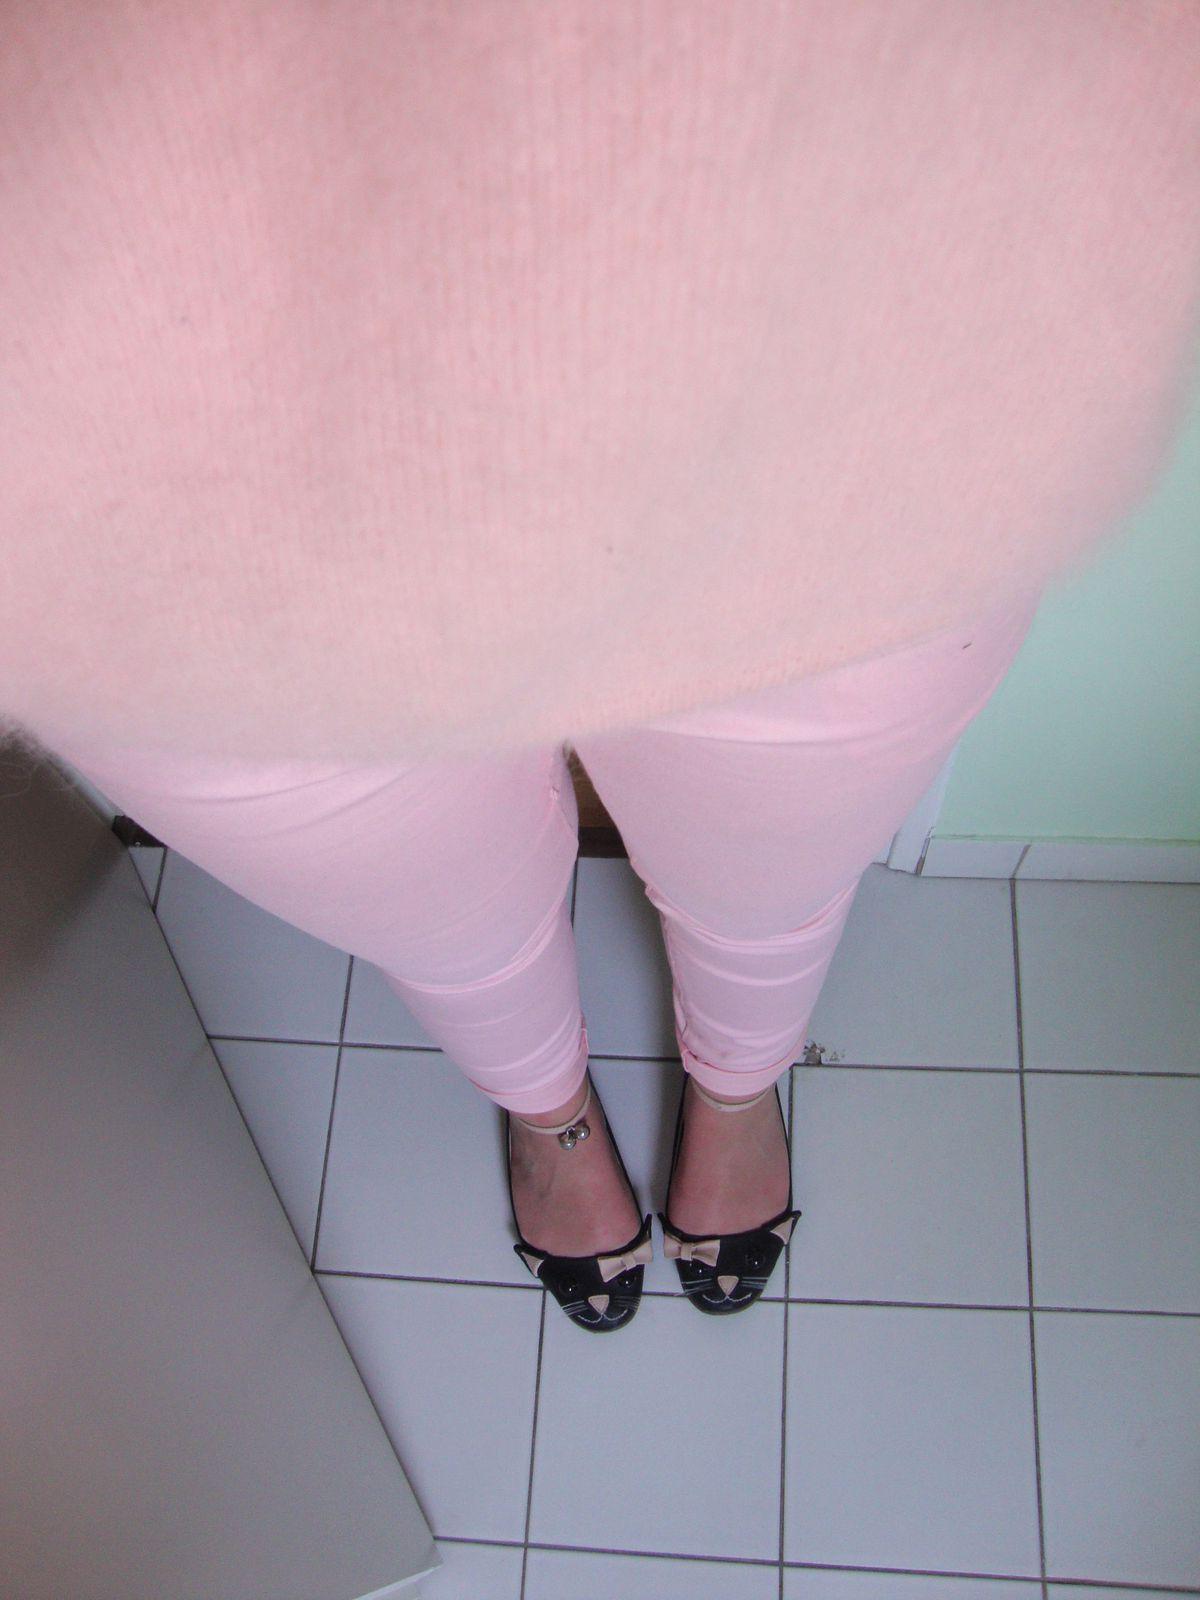 Rose petit cochon